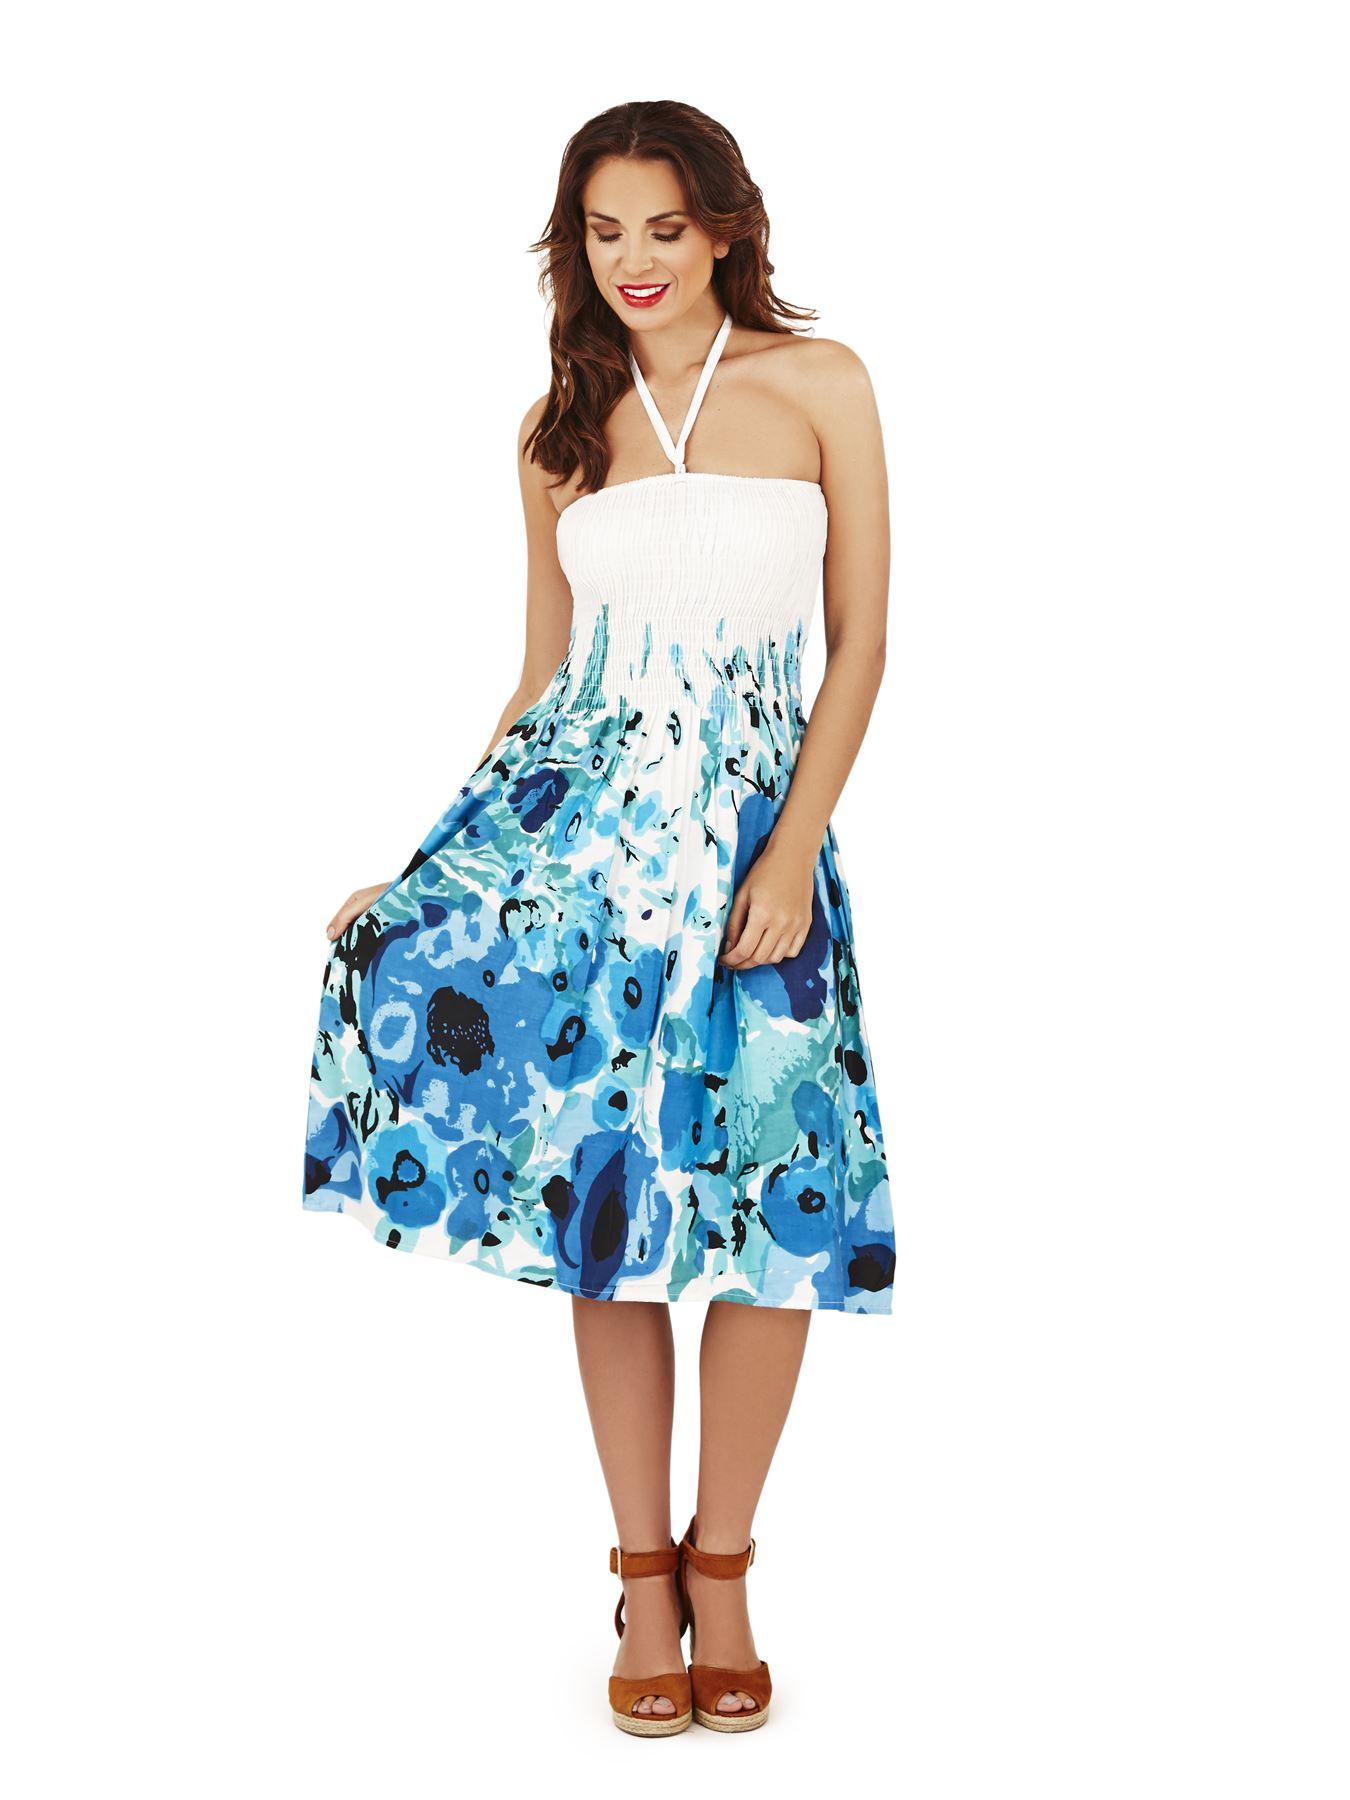 Martildo Ladies Summer Beach Cotton 2in1 Dress Light ...